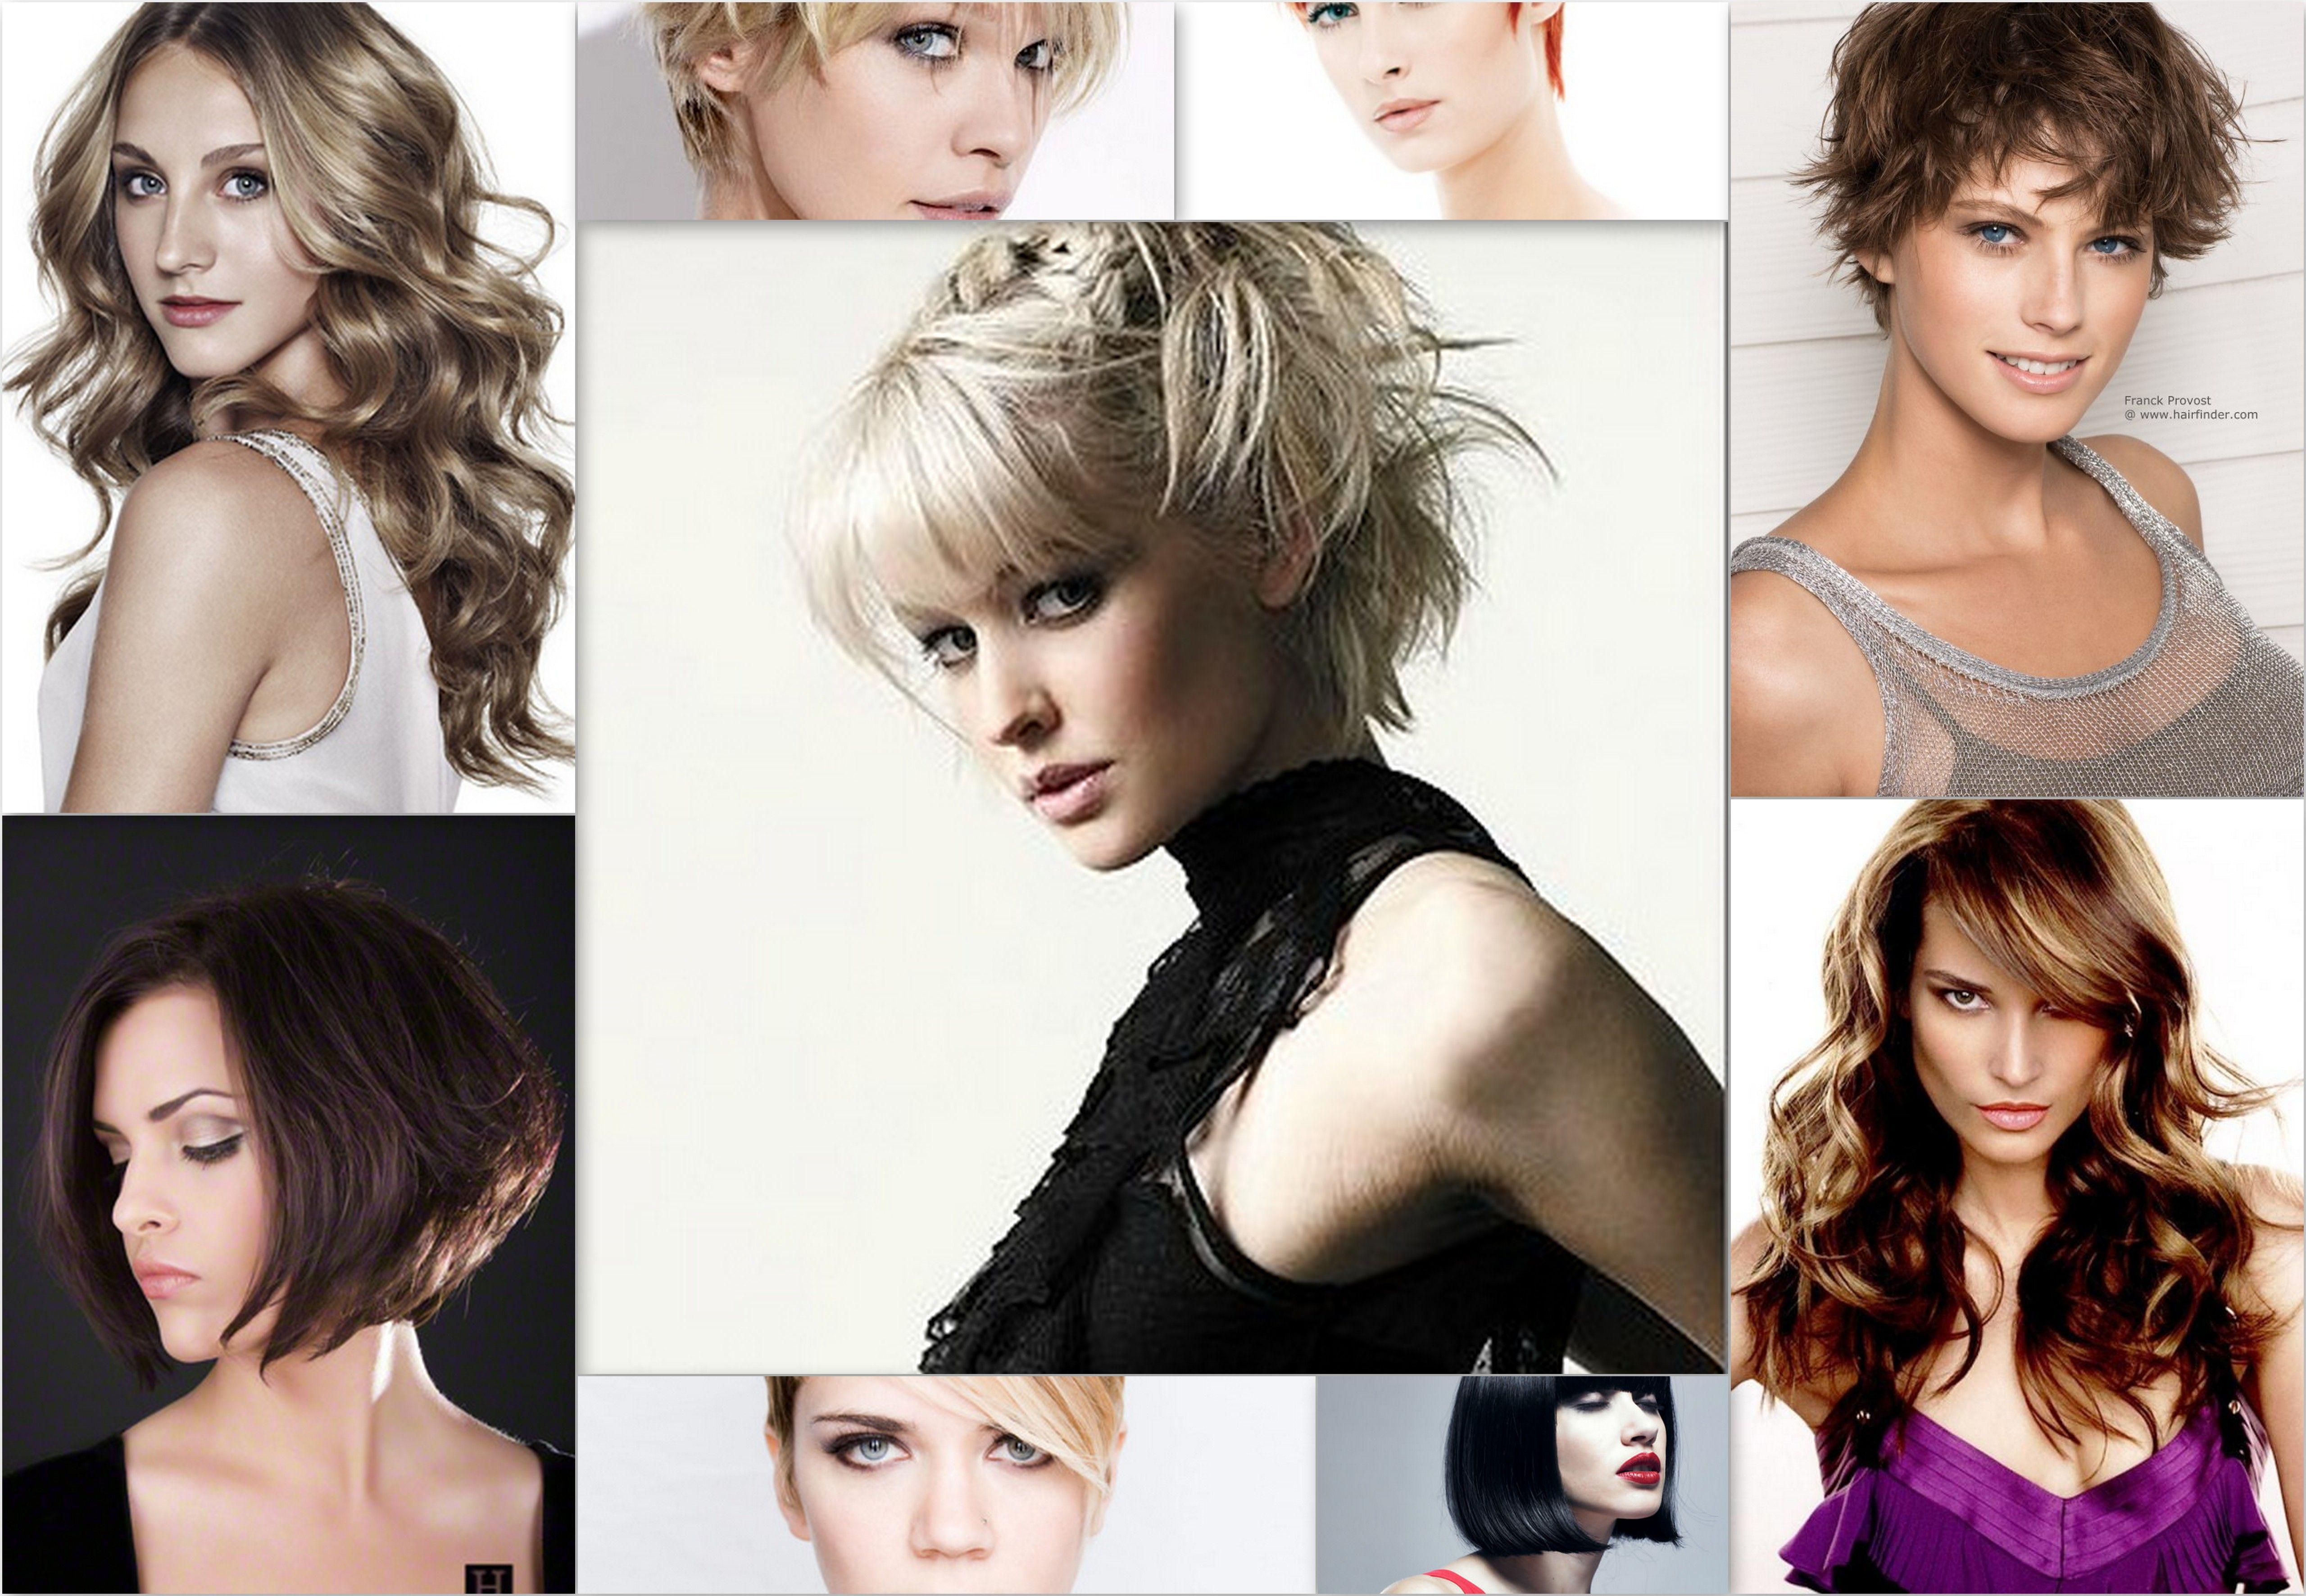 Hot Trendy Haircut Ideas From Hair Salon In Weston We Also Serve Fort Lauderdale Coral Springs Davie And Pembroke Pines Hair Hair Salon Best Hair Salon